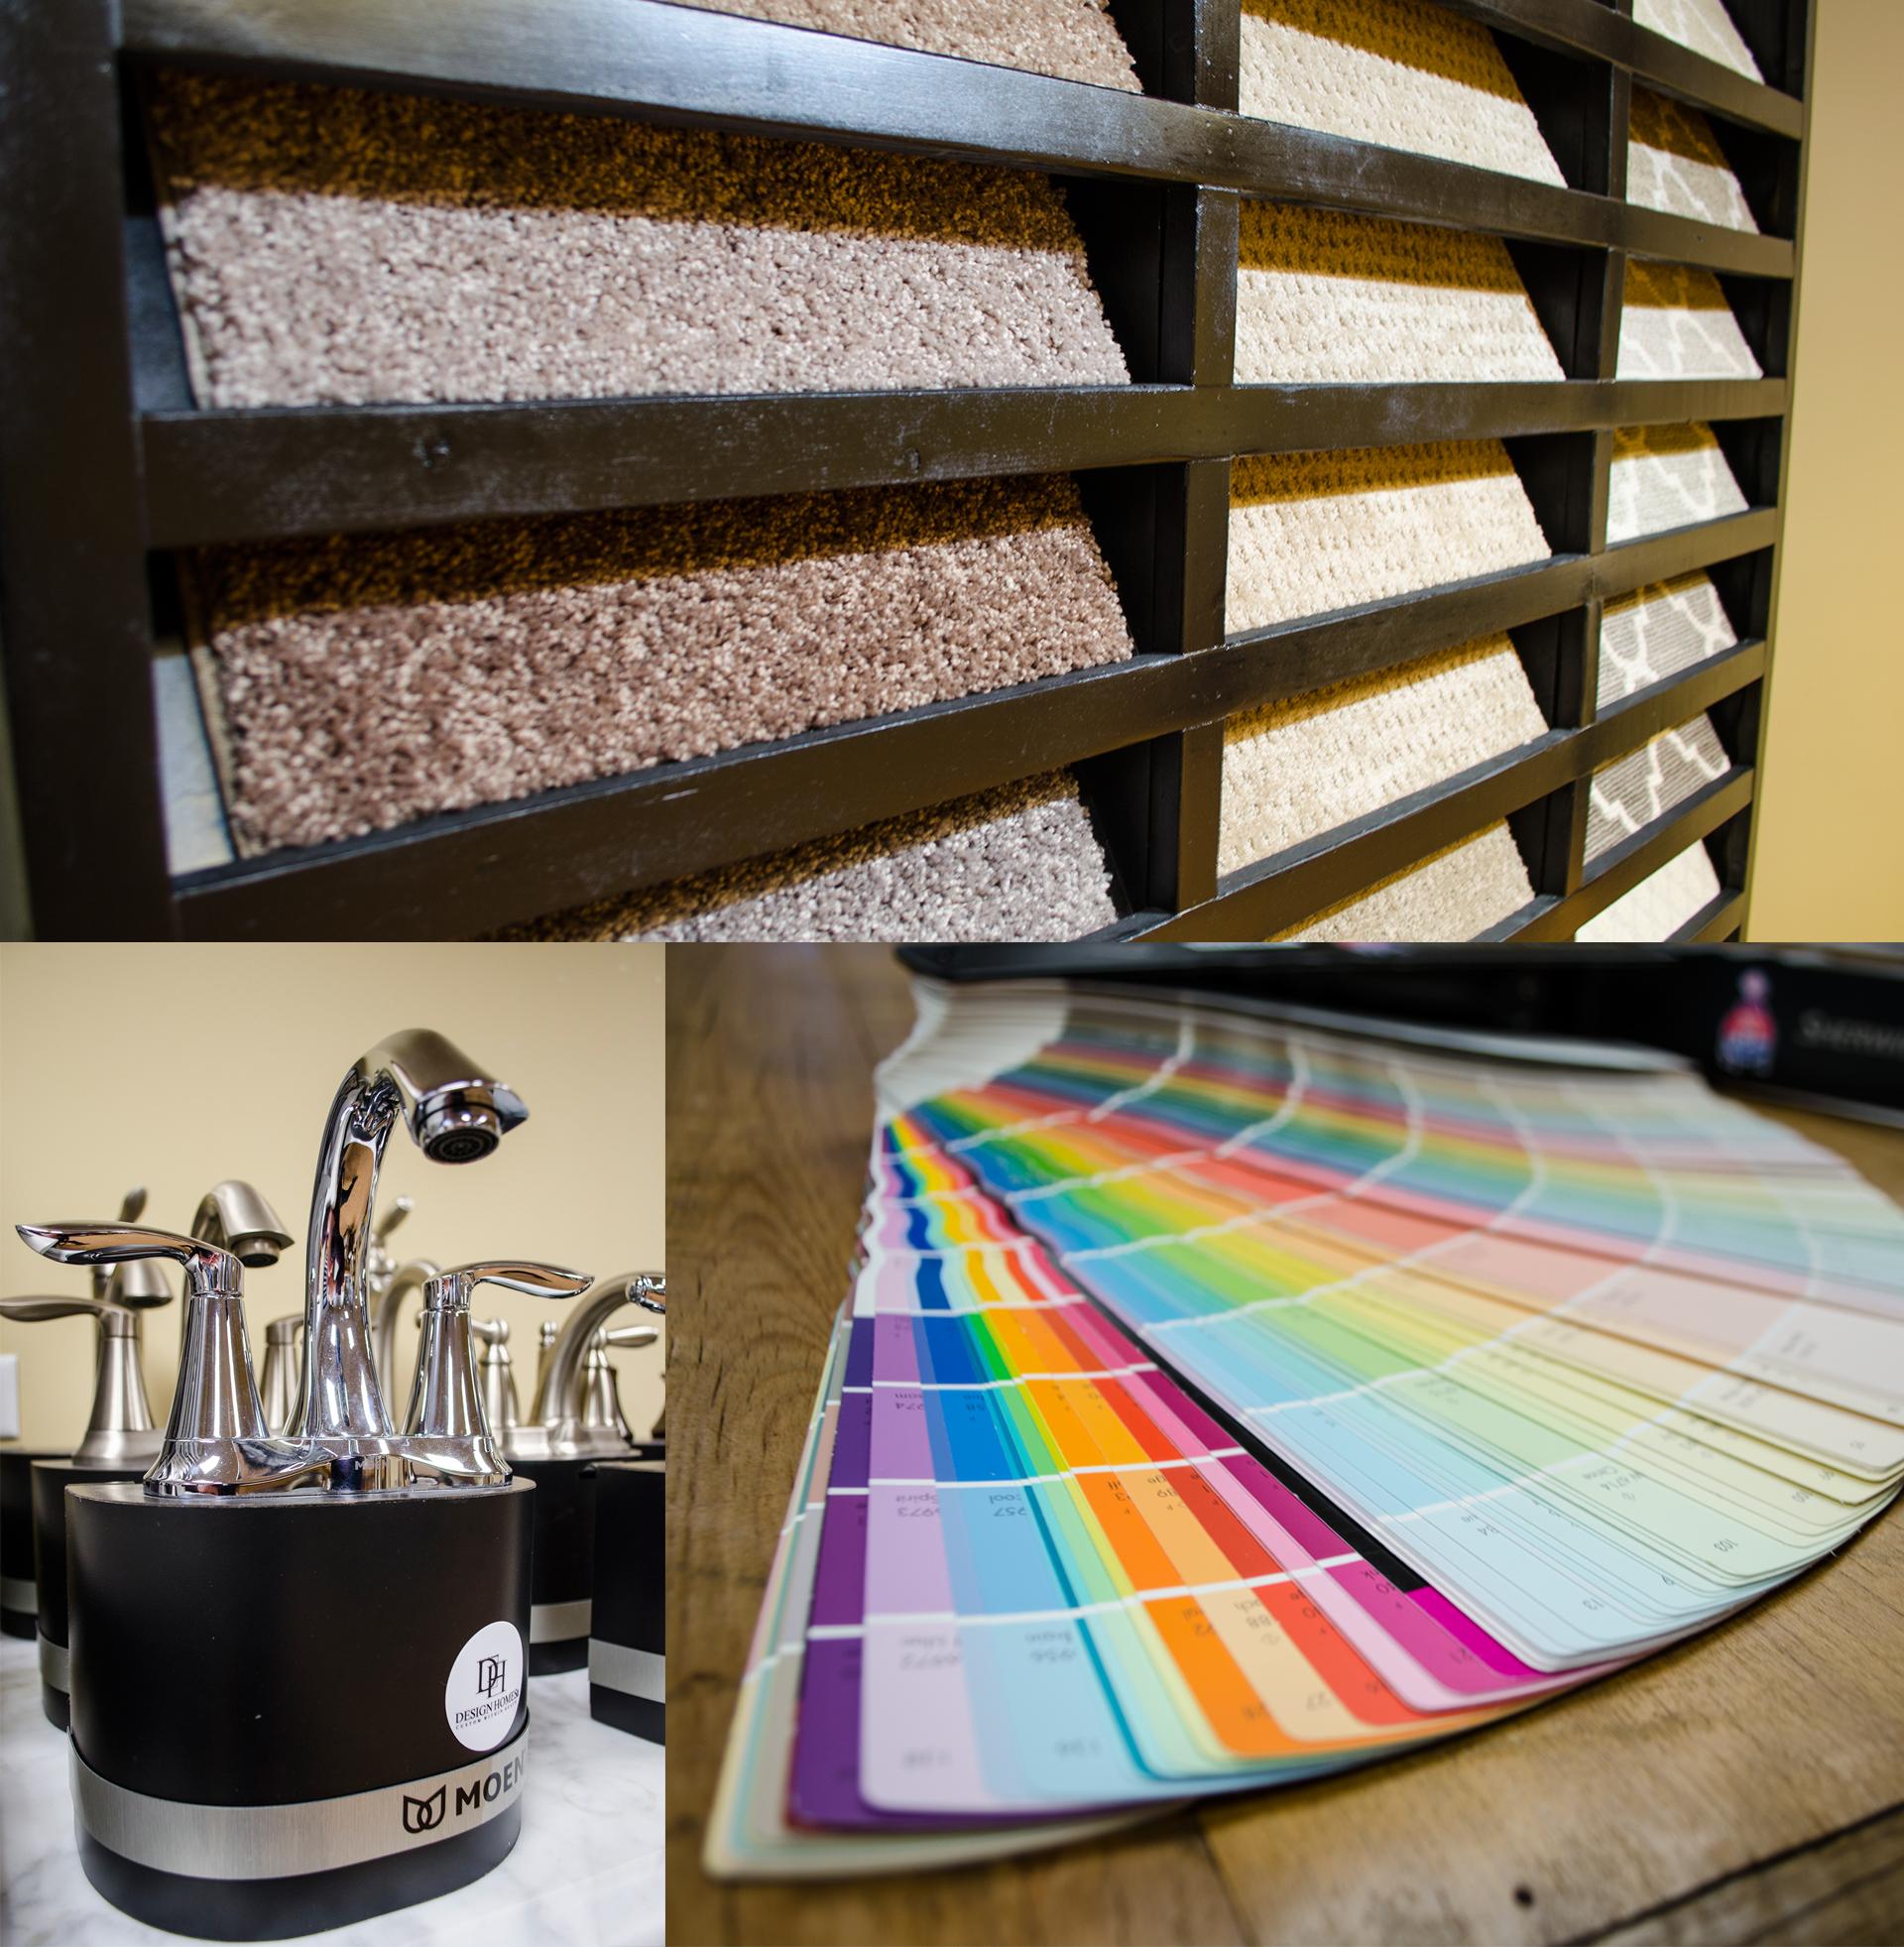 Design Homes design center for your custom home selections.